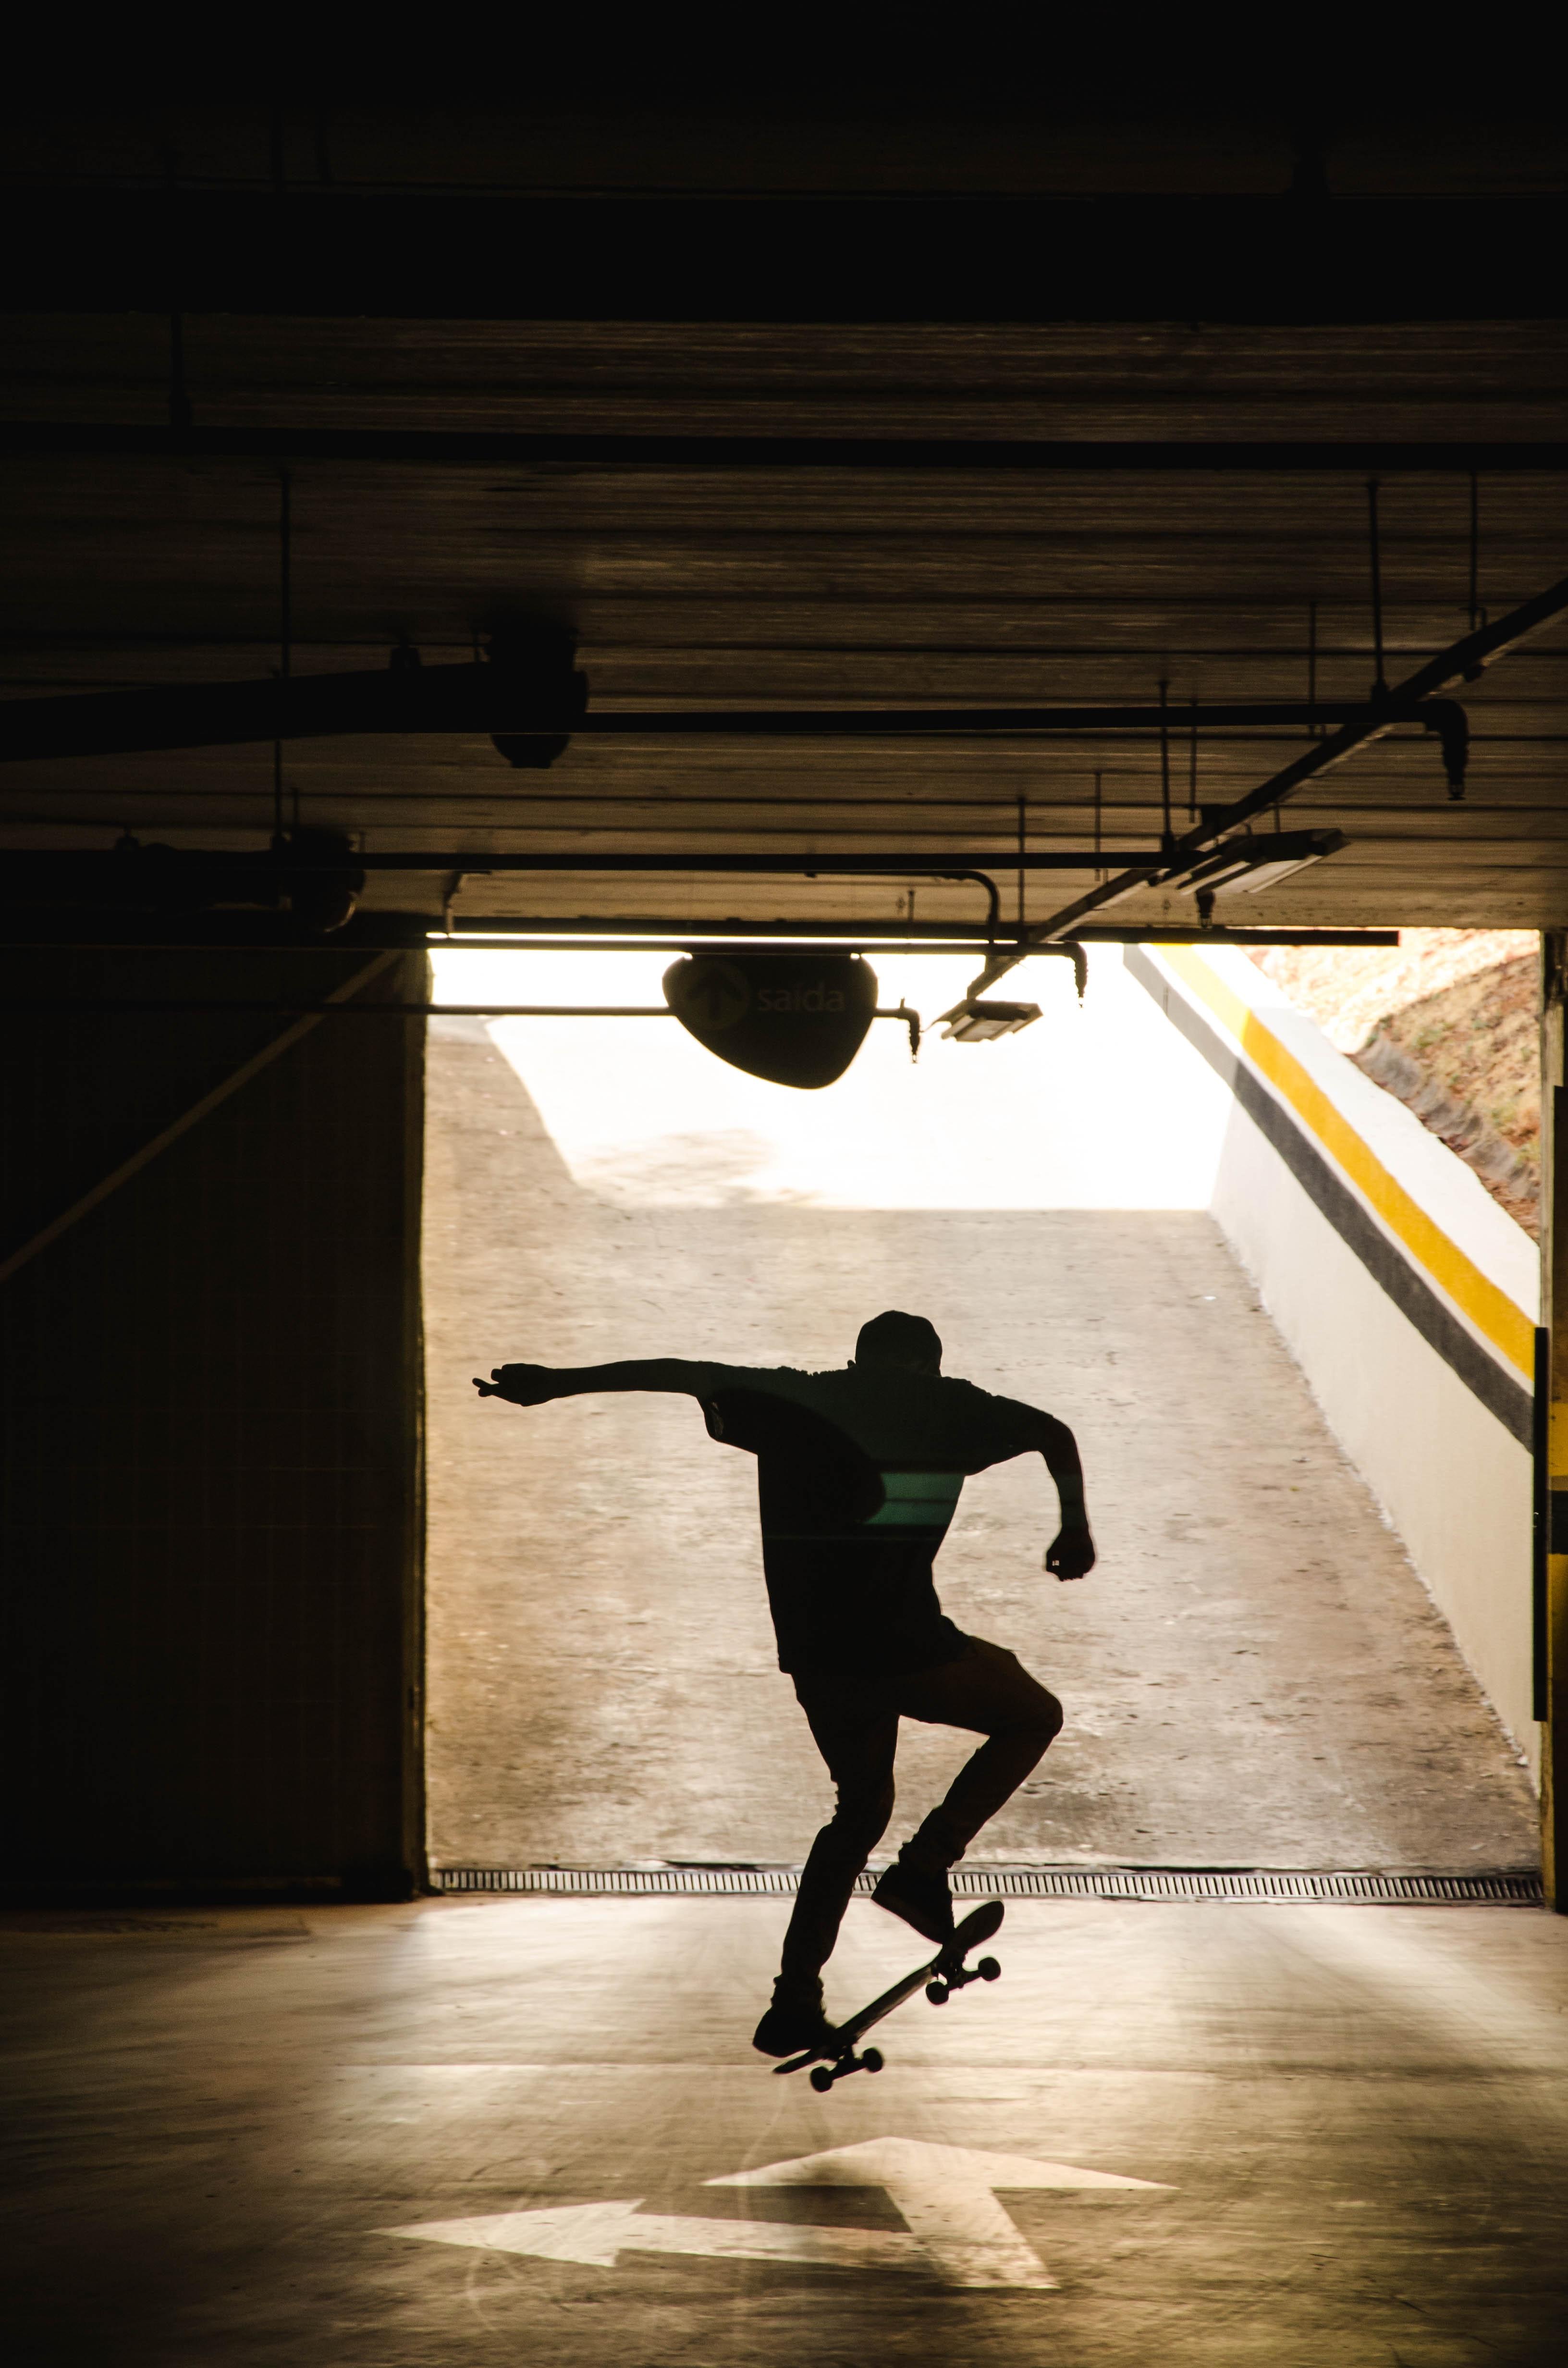 99498 скачать обои Спорт, Скейтборд, Скейтер, Силуэт, Трюк - заставки и картинки бесплатно